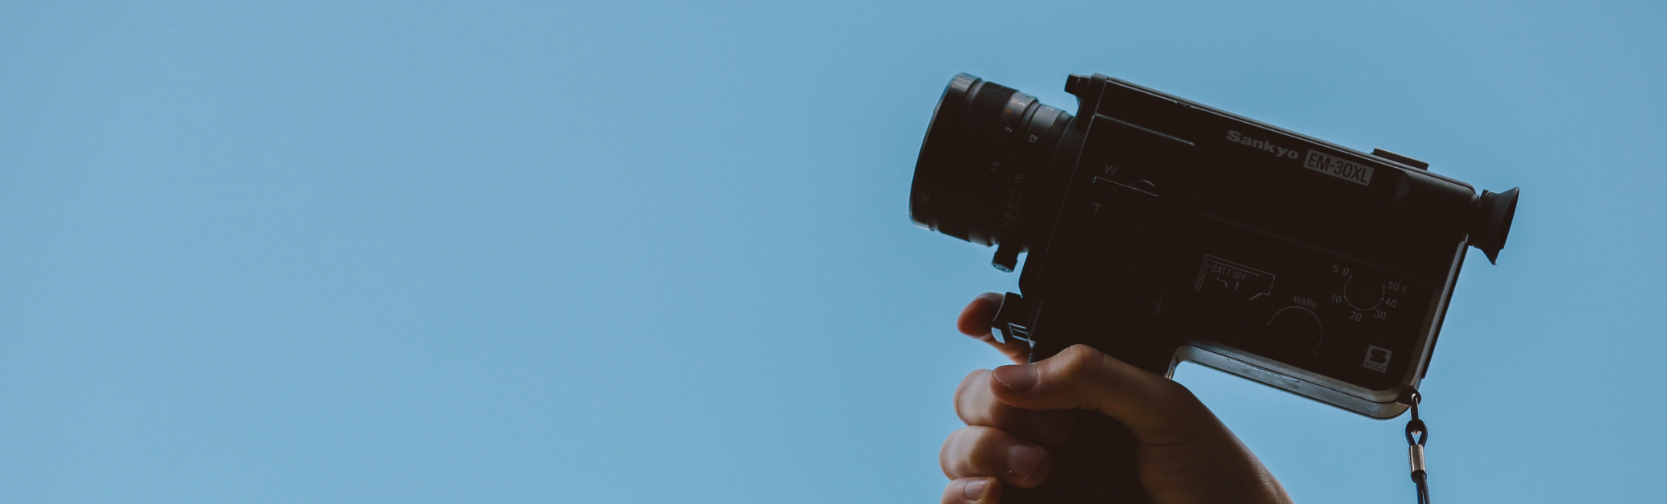 Sponsored Video Content Marketing